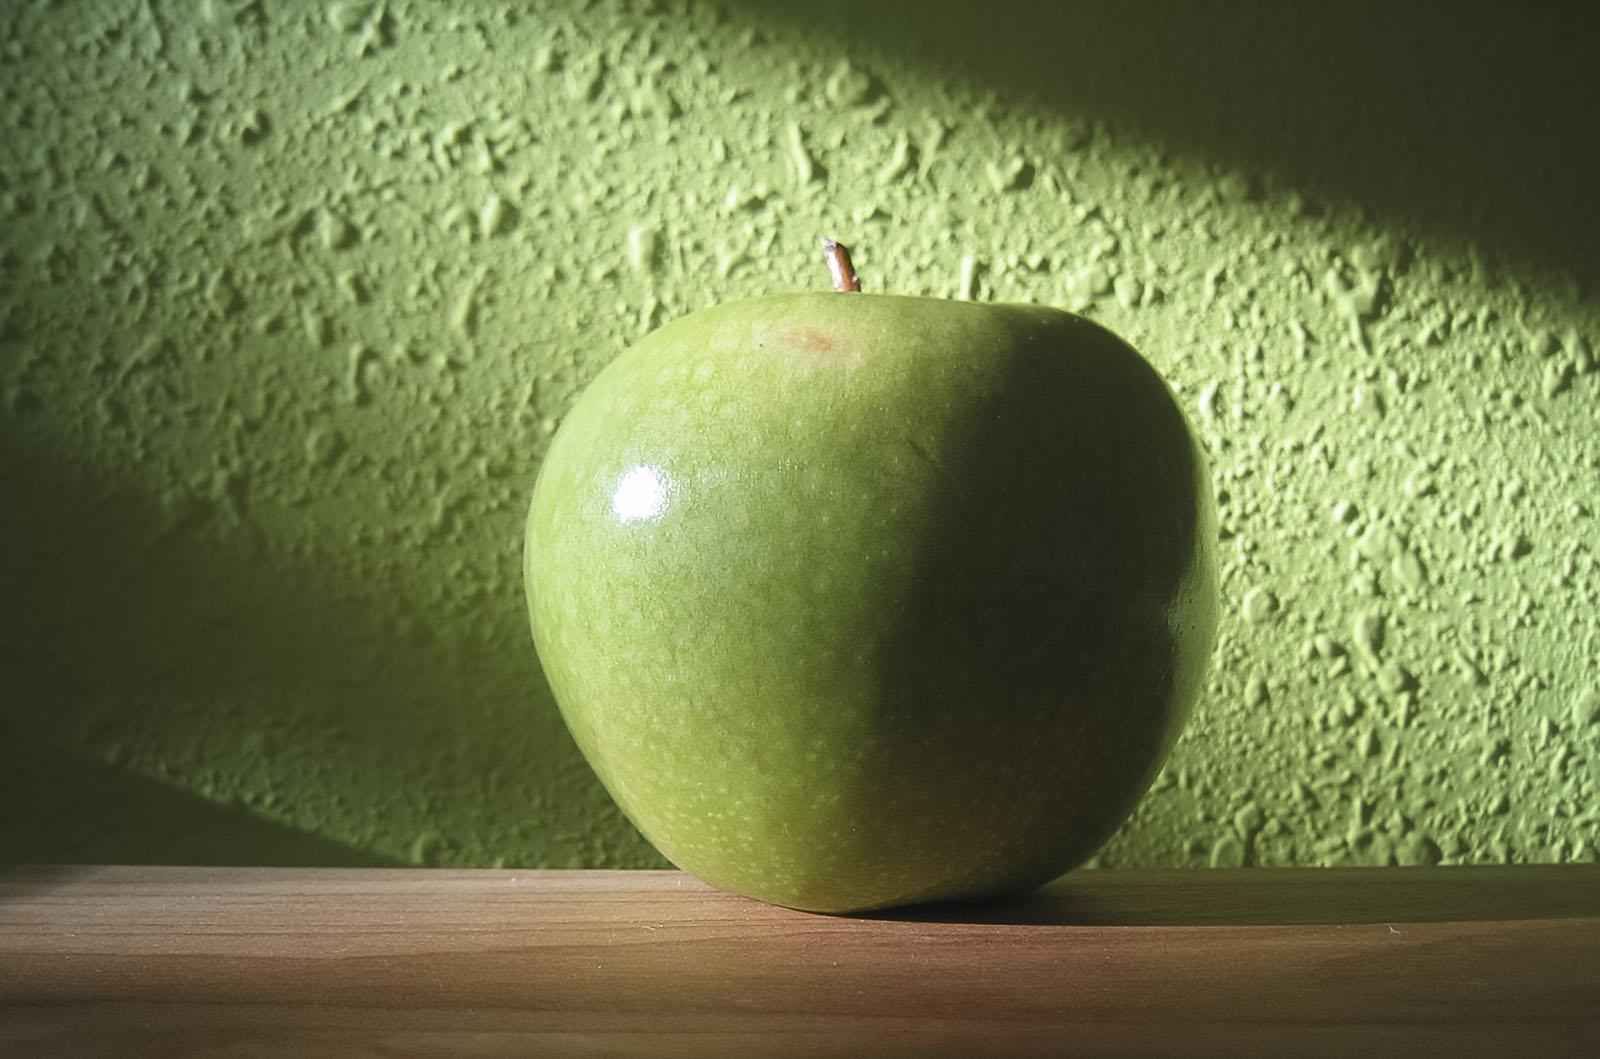 01_detail_apple_f04_web.jpg